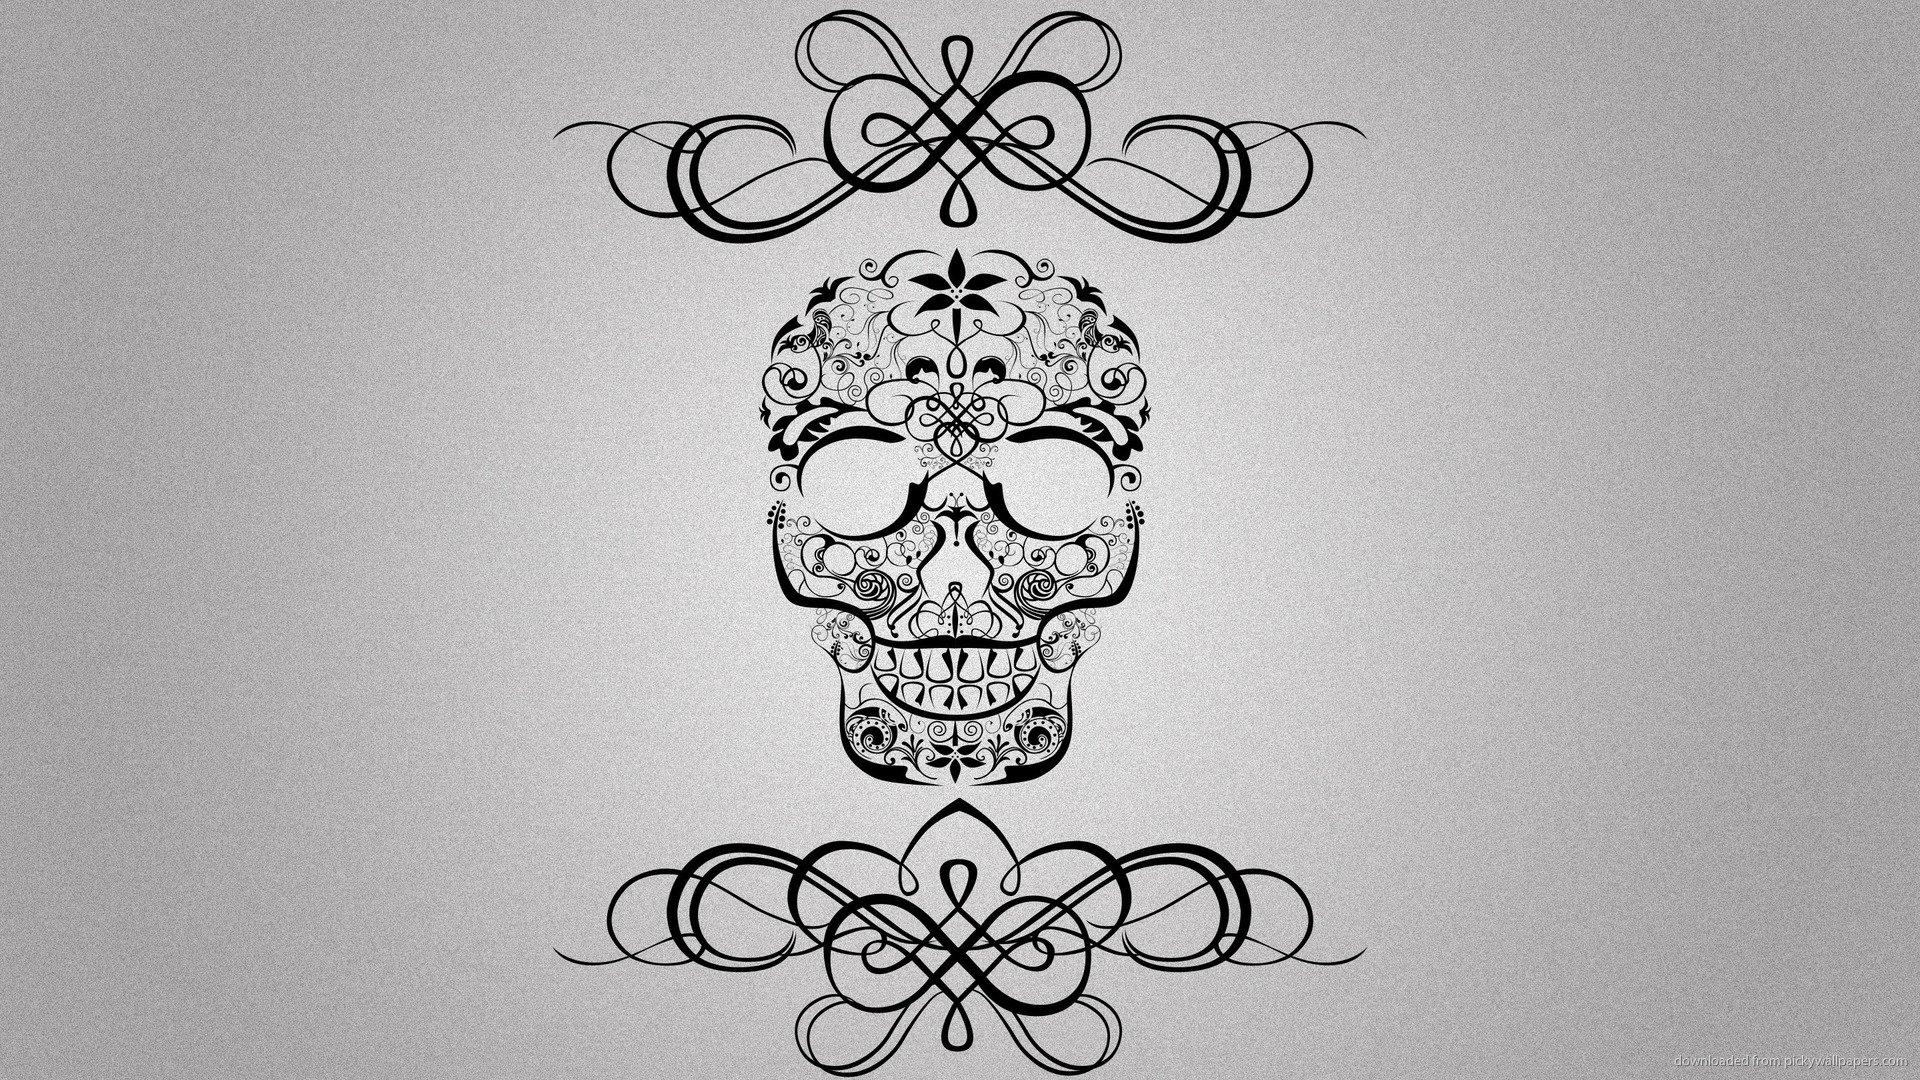 Skull Picture For iPhone Blackberry iPad Symmetrical Skull 1920x1080